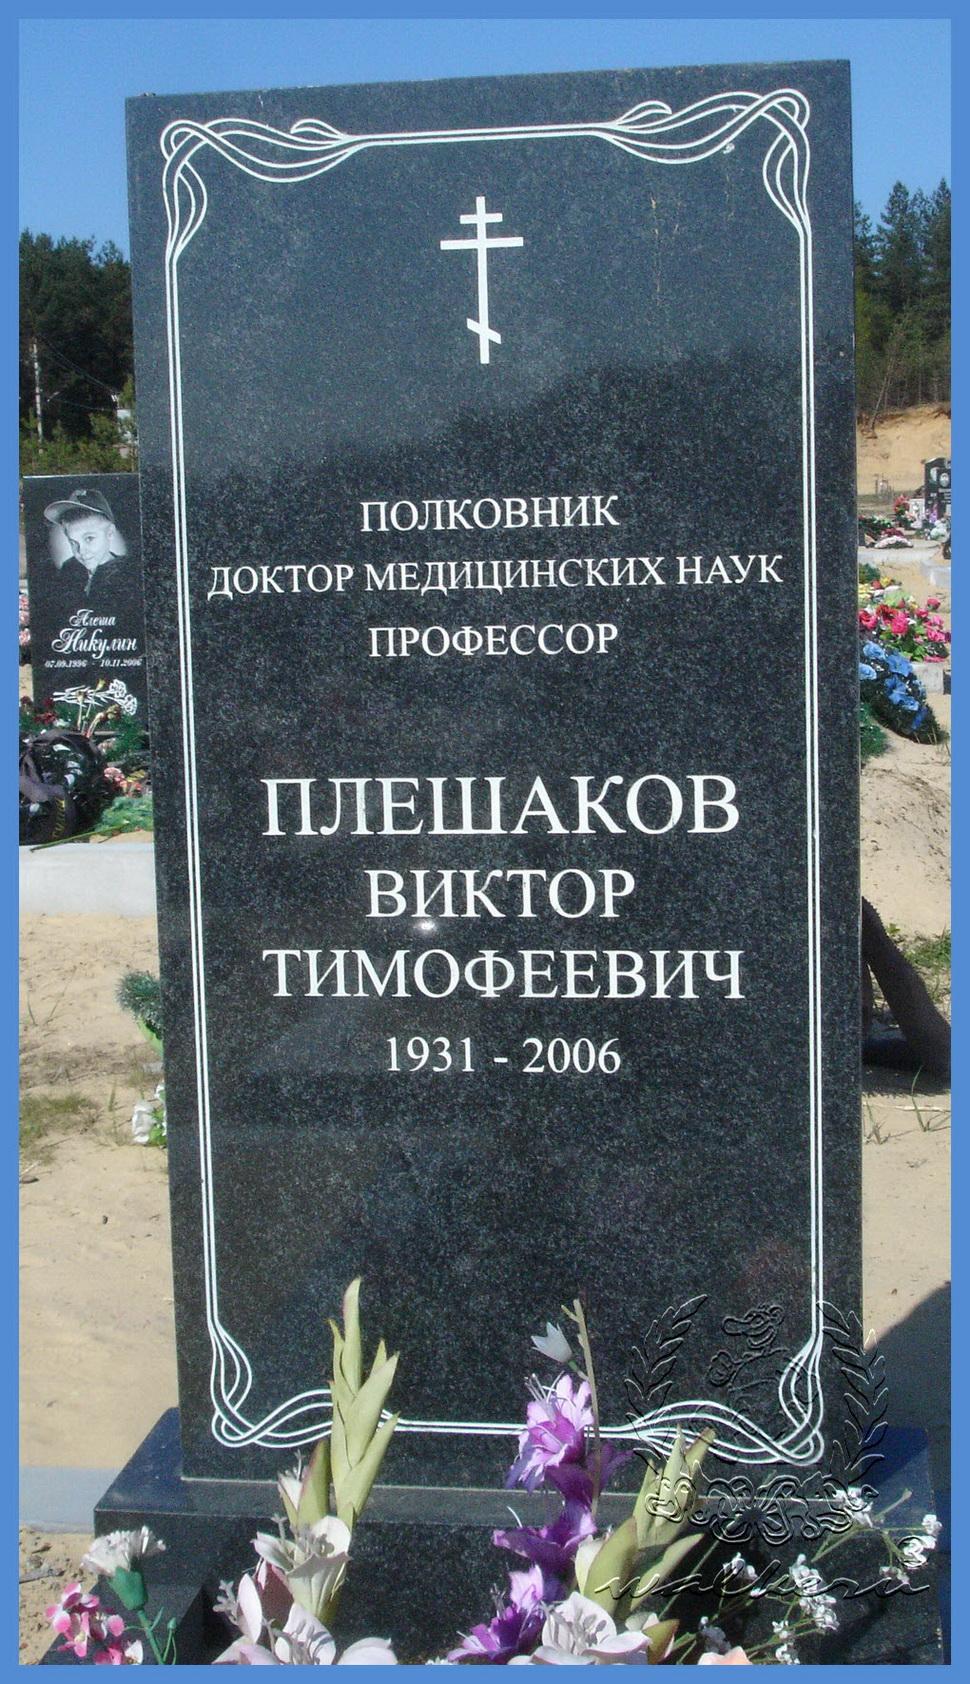 Плешаков Виктор Тимофеевич